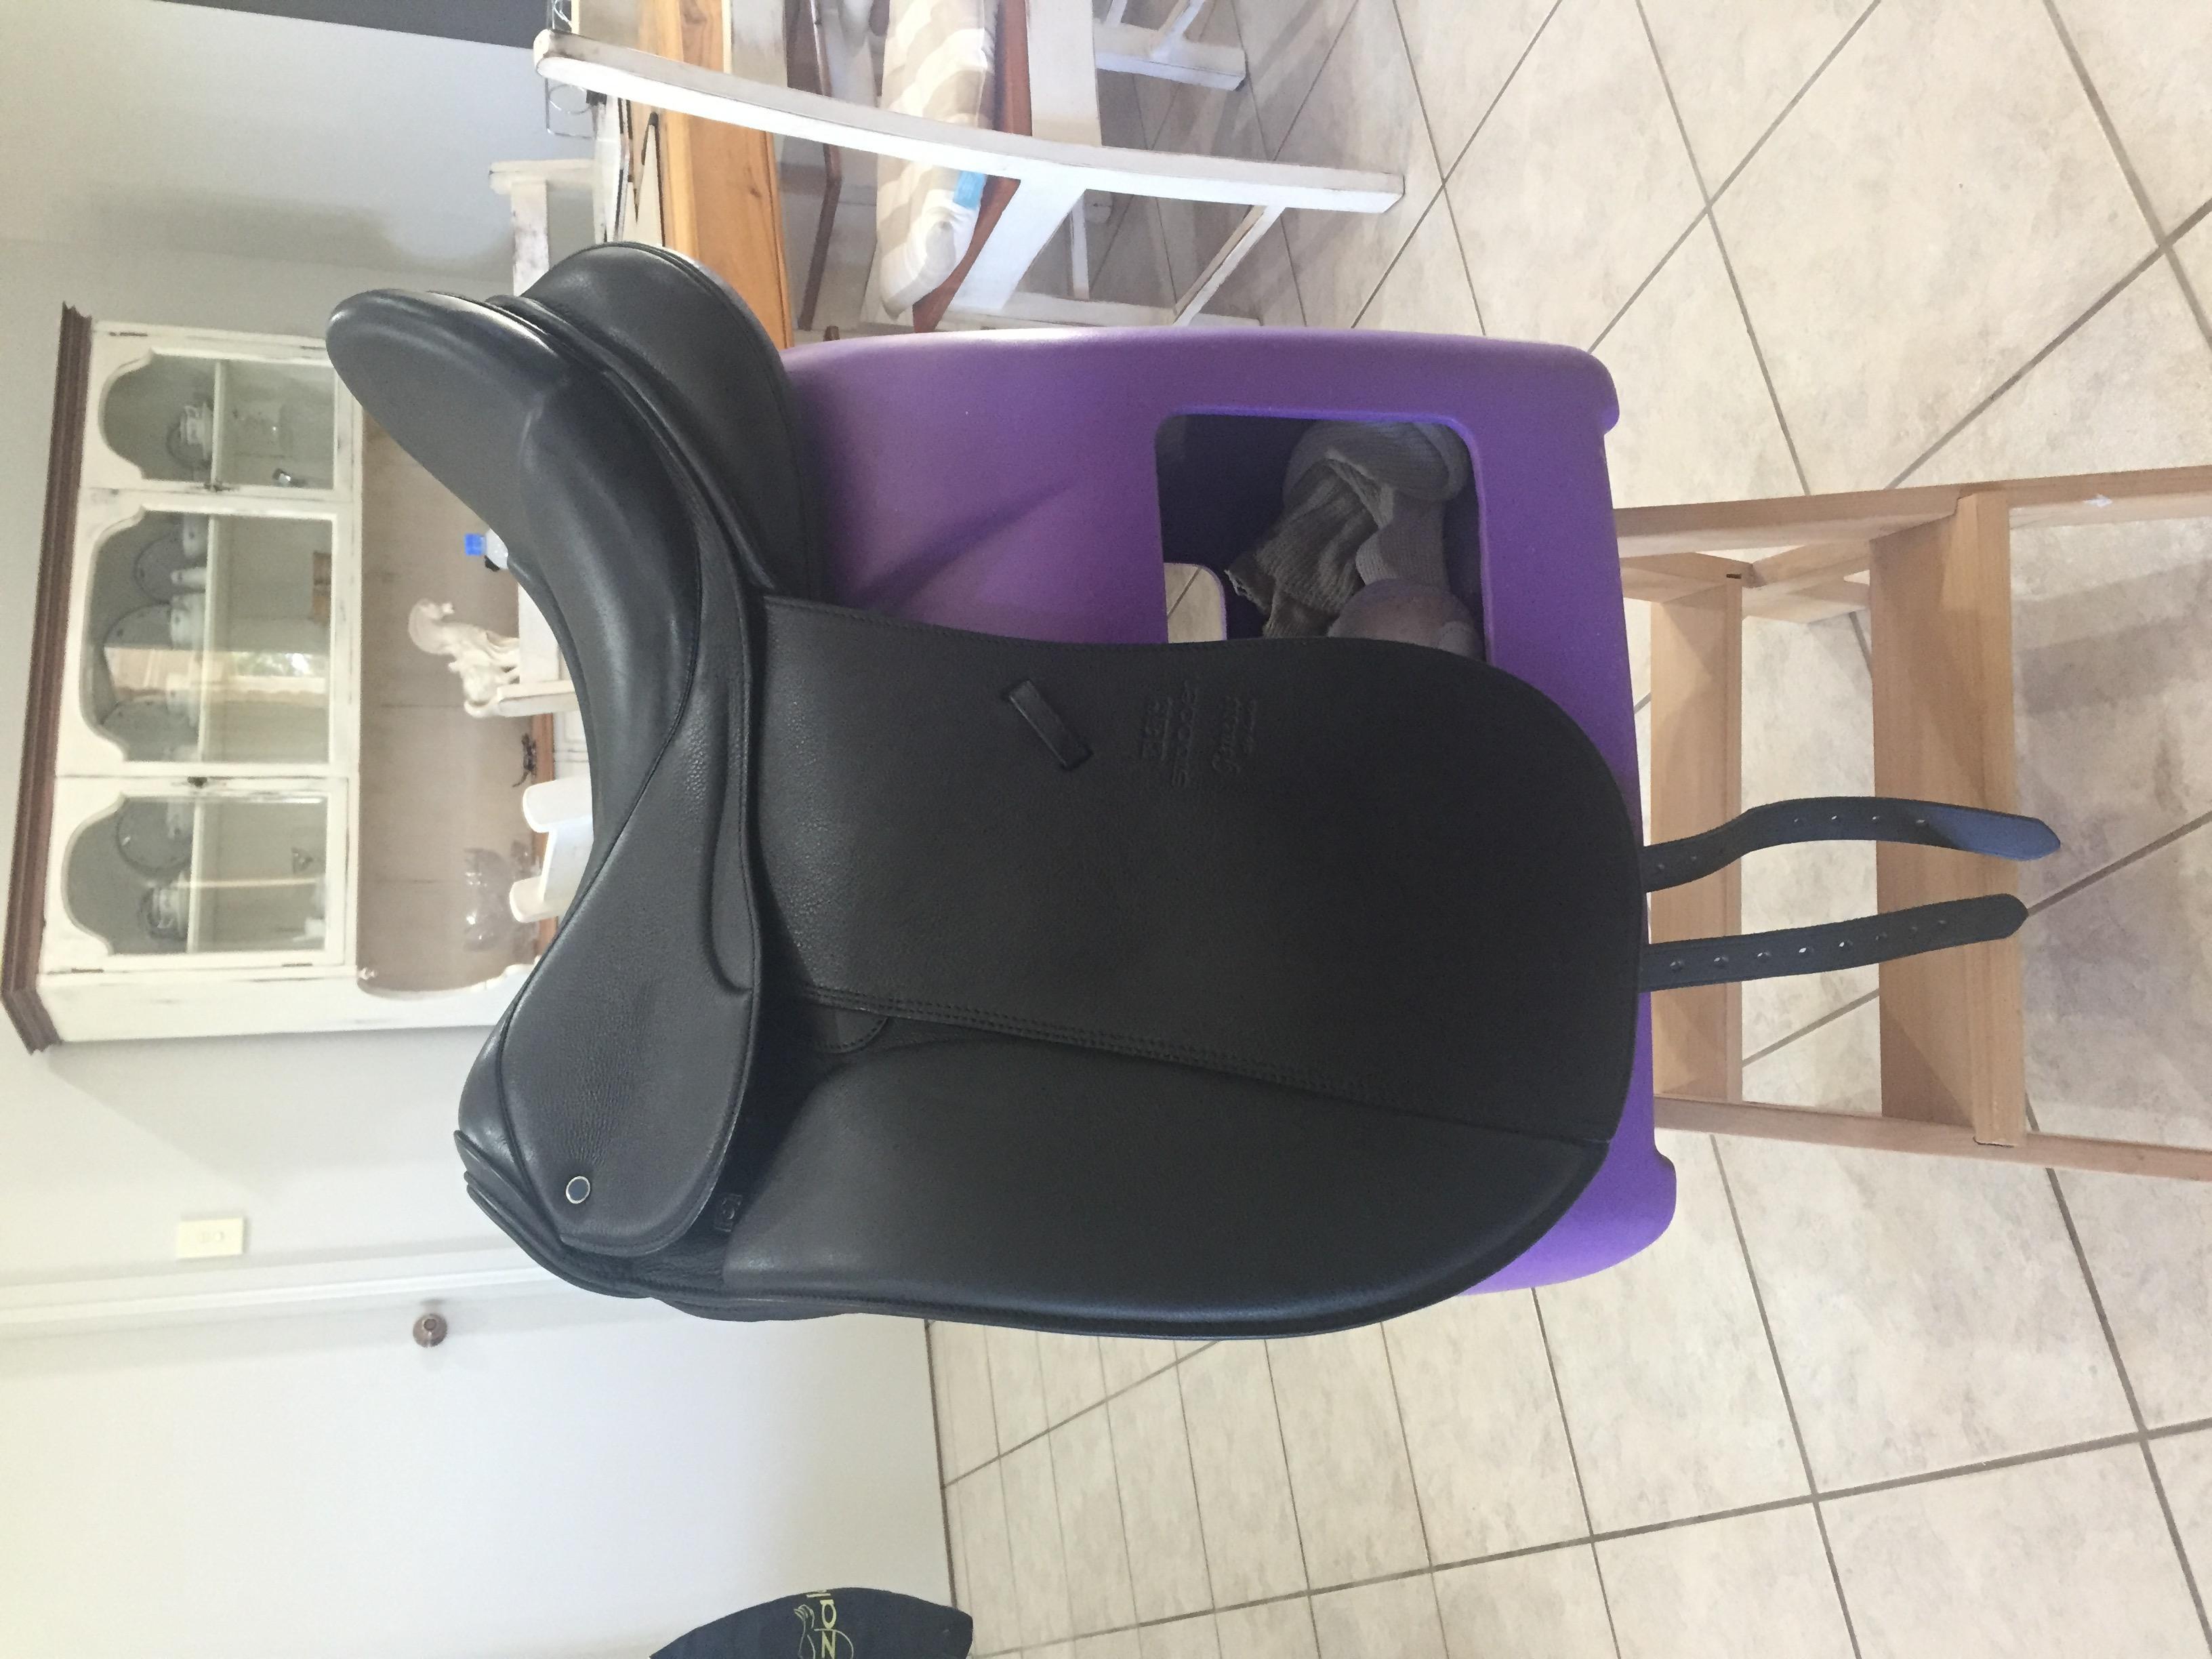 Black Stübben Genesis Deluxe Dressage Saddle with Biomex Seat